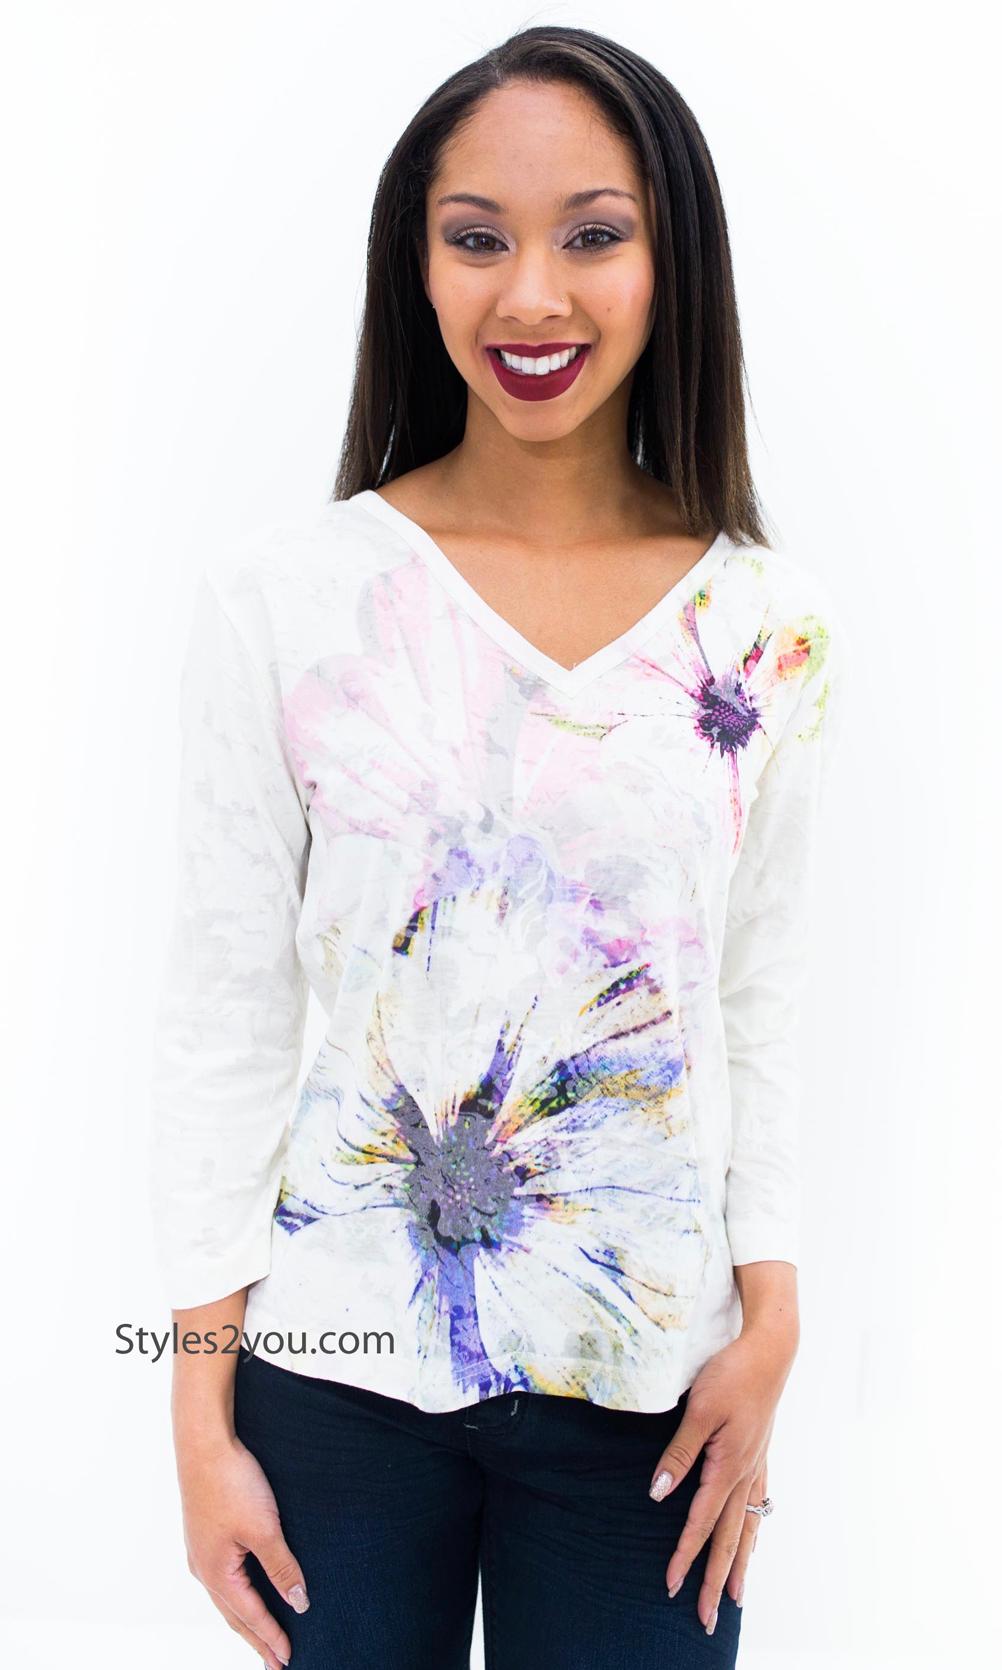 Mona 3 4 Sleeve V Neck Burnout Tye Dye Top With Vintage